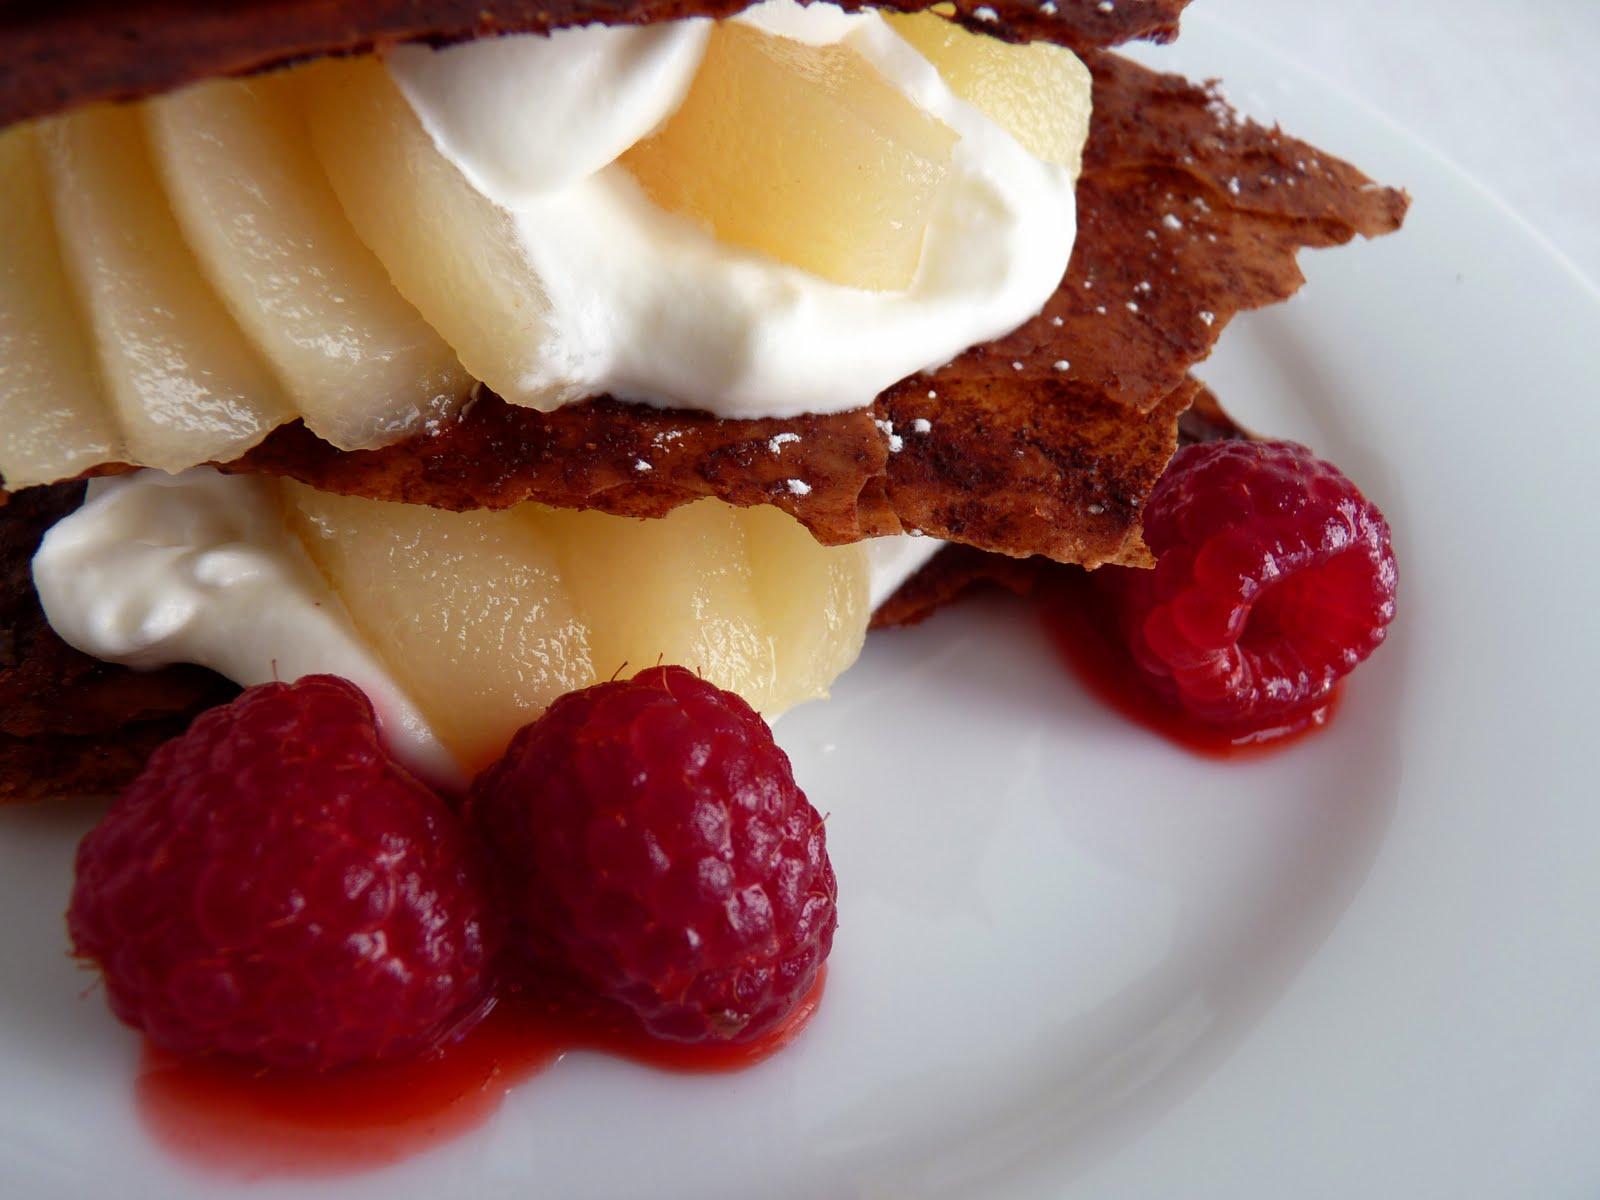 pastry studio: Chocolate Phyllo Napoleons with Pear and Raspberries